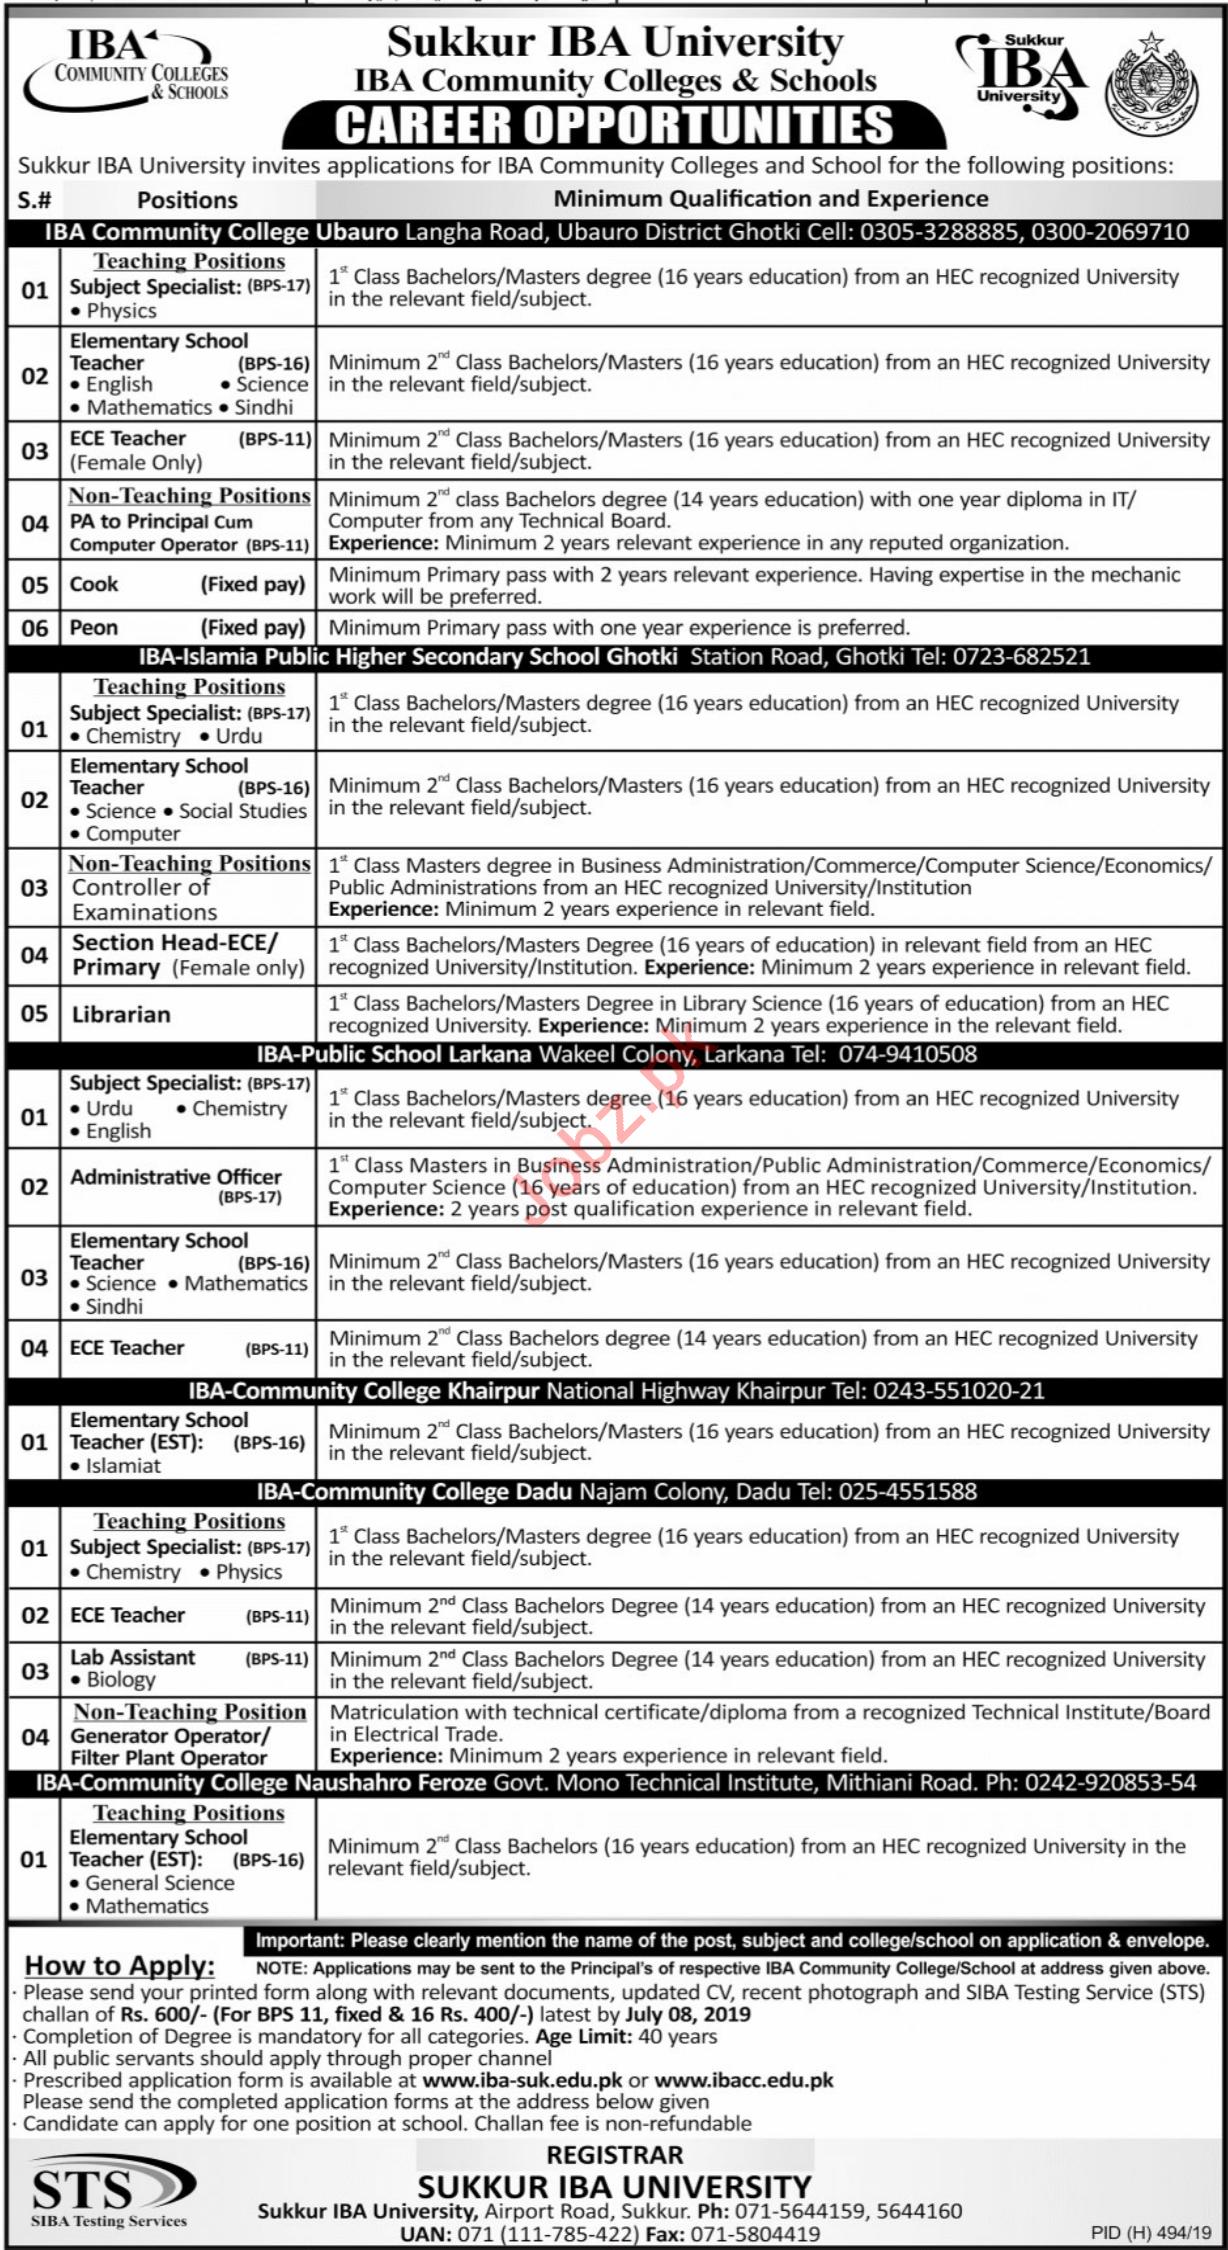 IBA Community Colleges & Schools Jobs 2019 in Sukkur